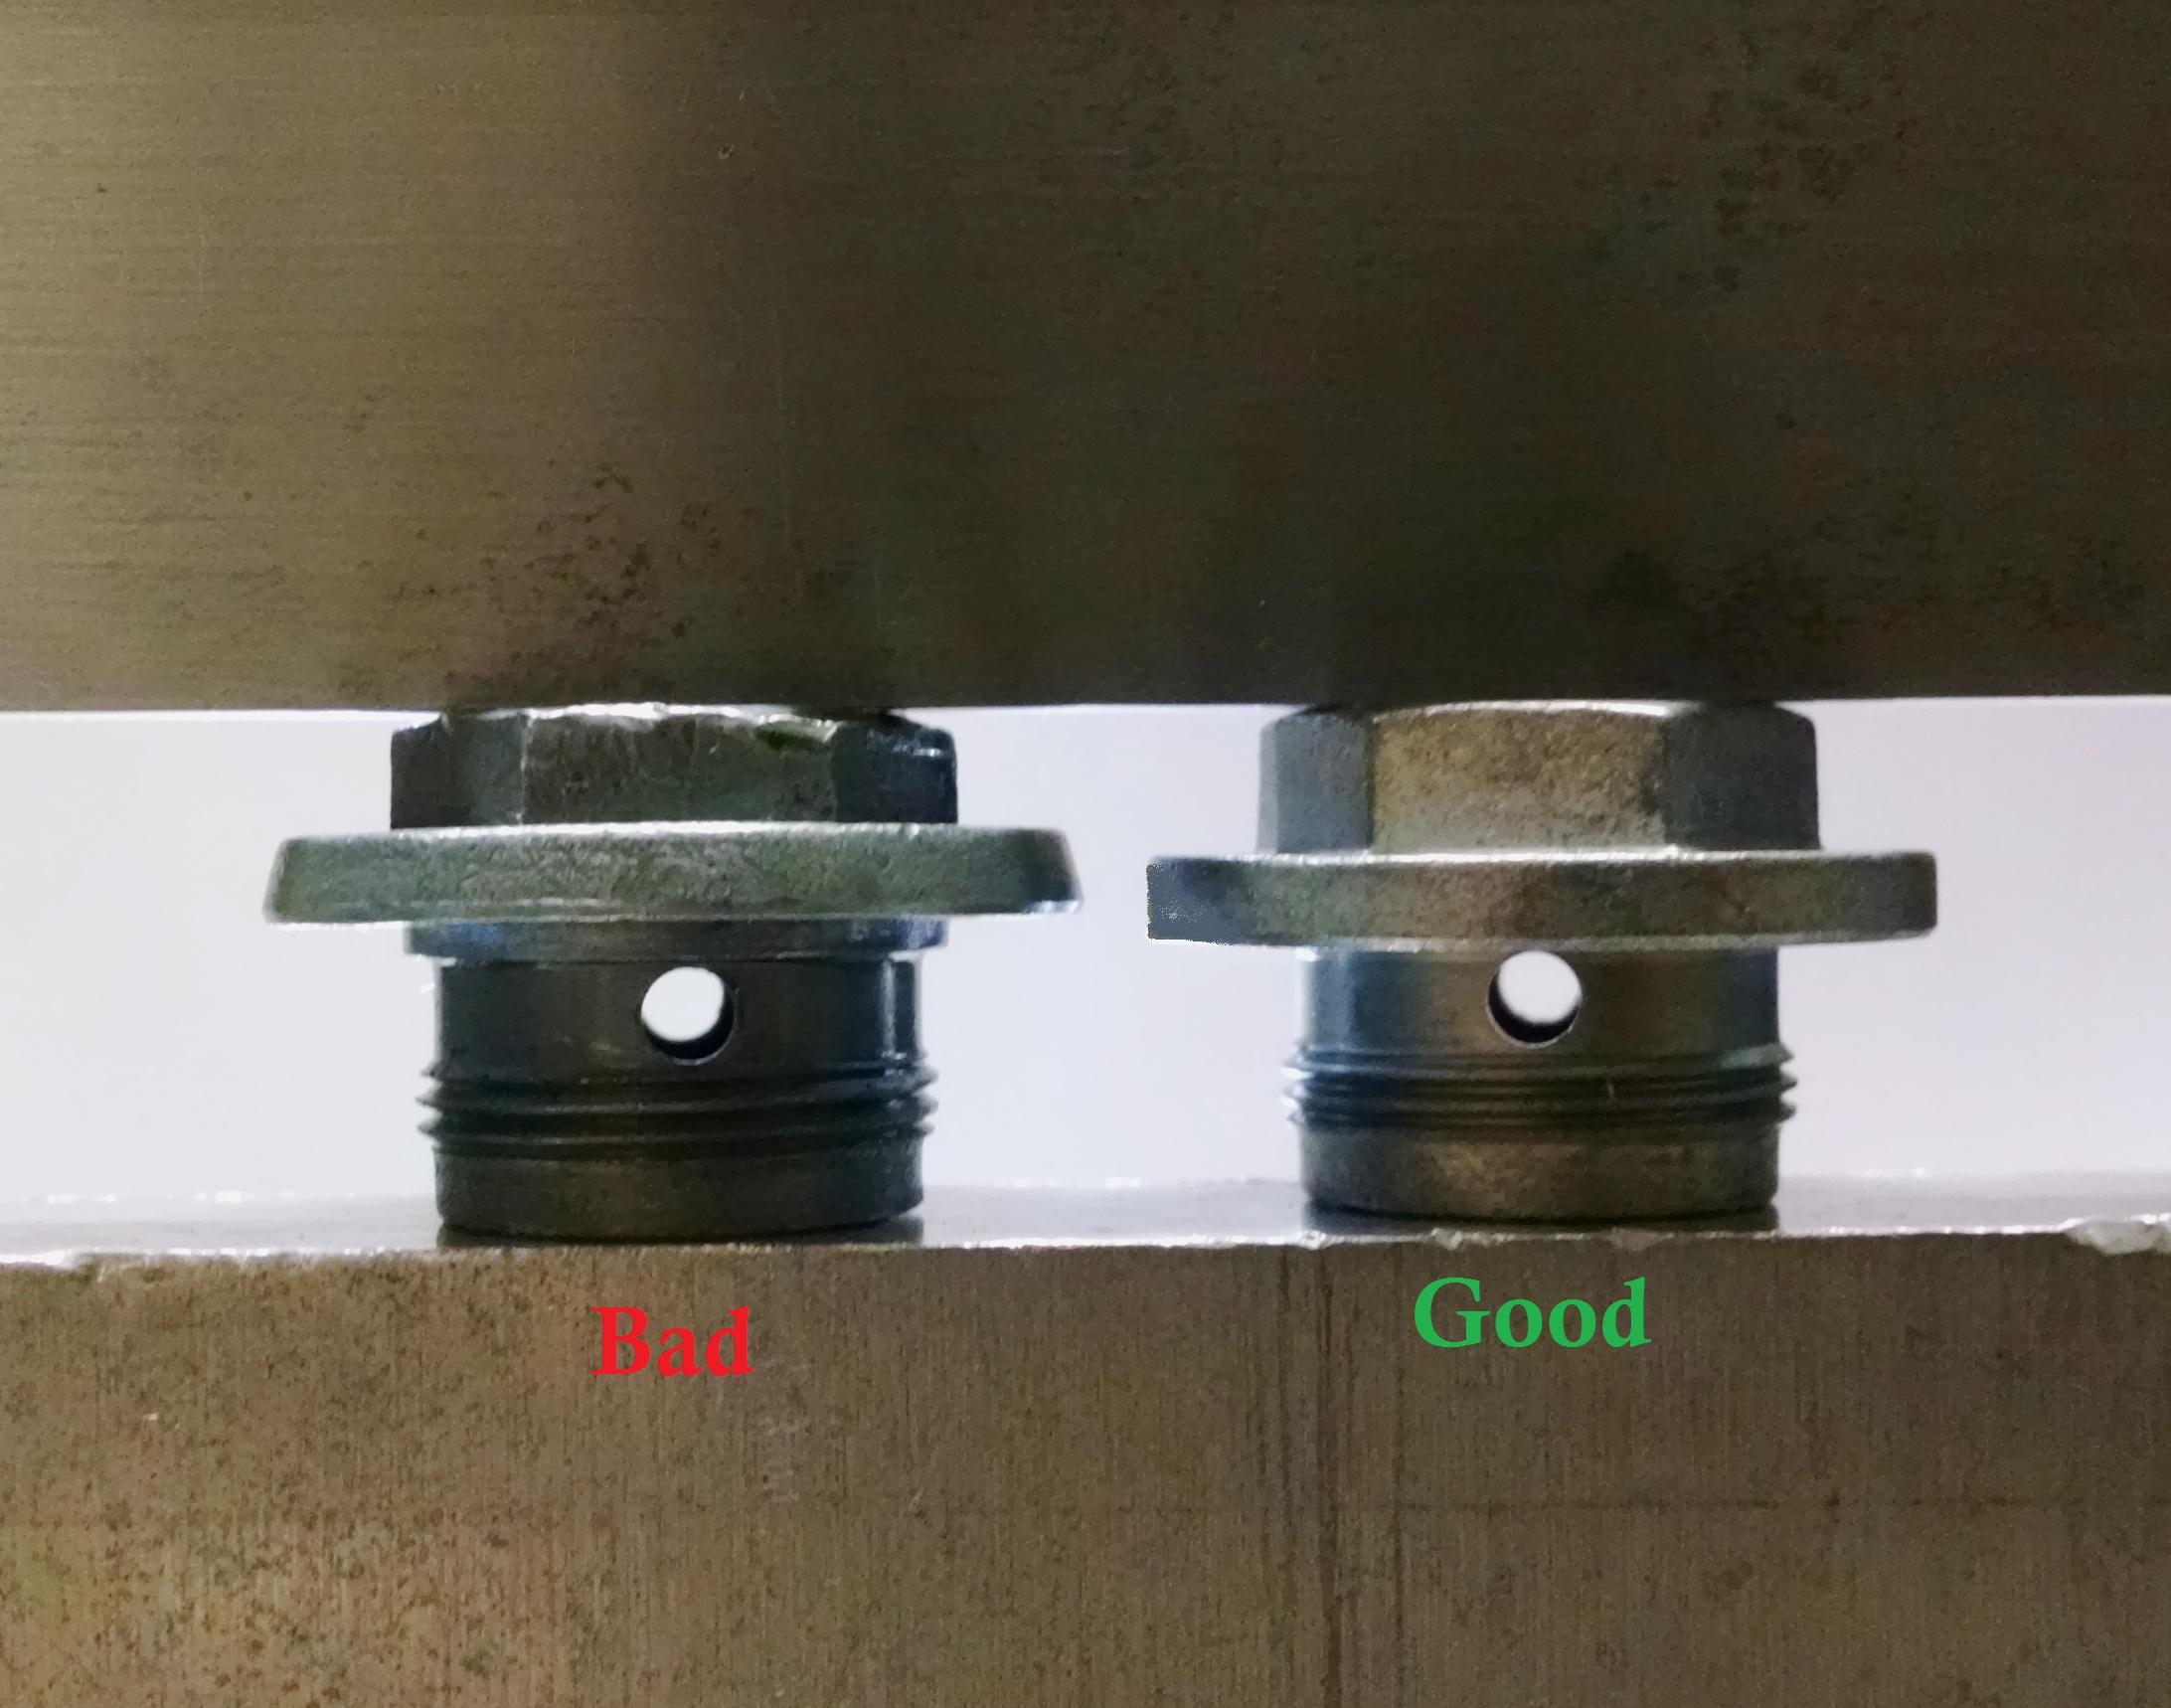 Good Drain Plug vs Bad Drain Plug